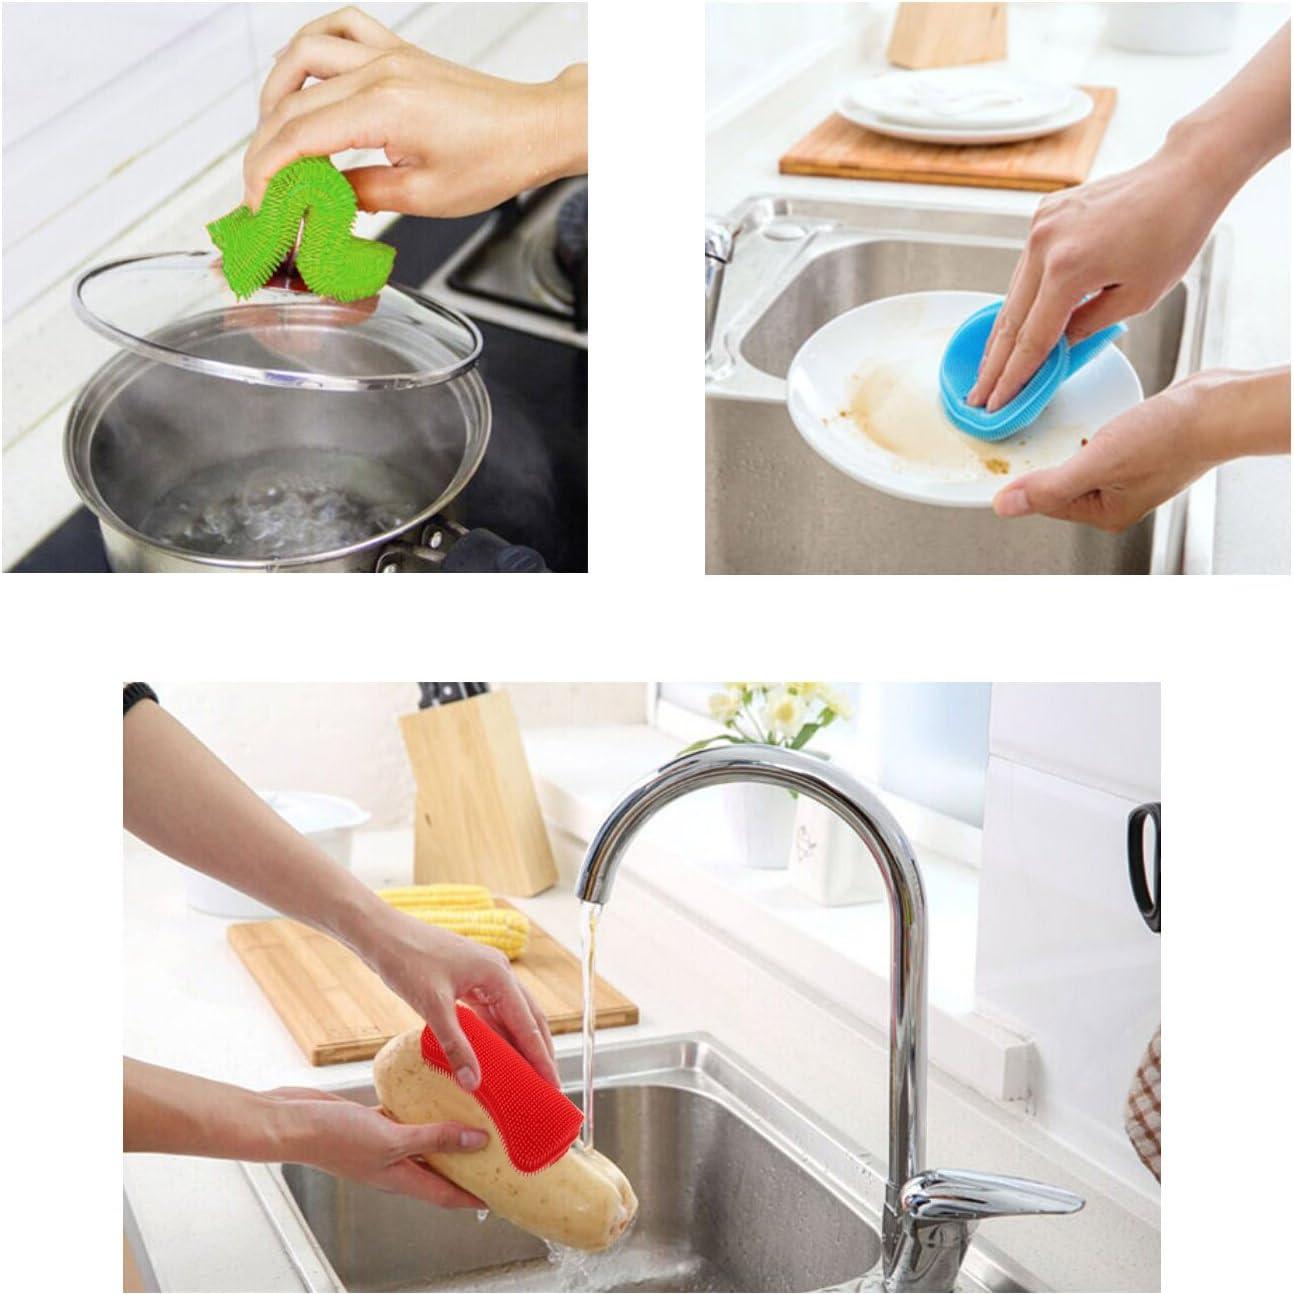 Kitchen Silicone Sponge 1 Pack Anti-Bacterial Cleaning Scrubber Pot Holder Multipurpose Dish-Washing Mildew Free Brush for Dish Vegetables Baby Bottles